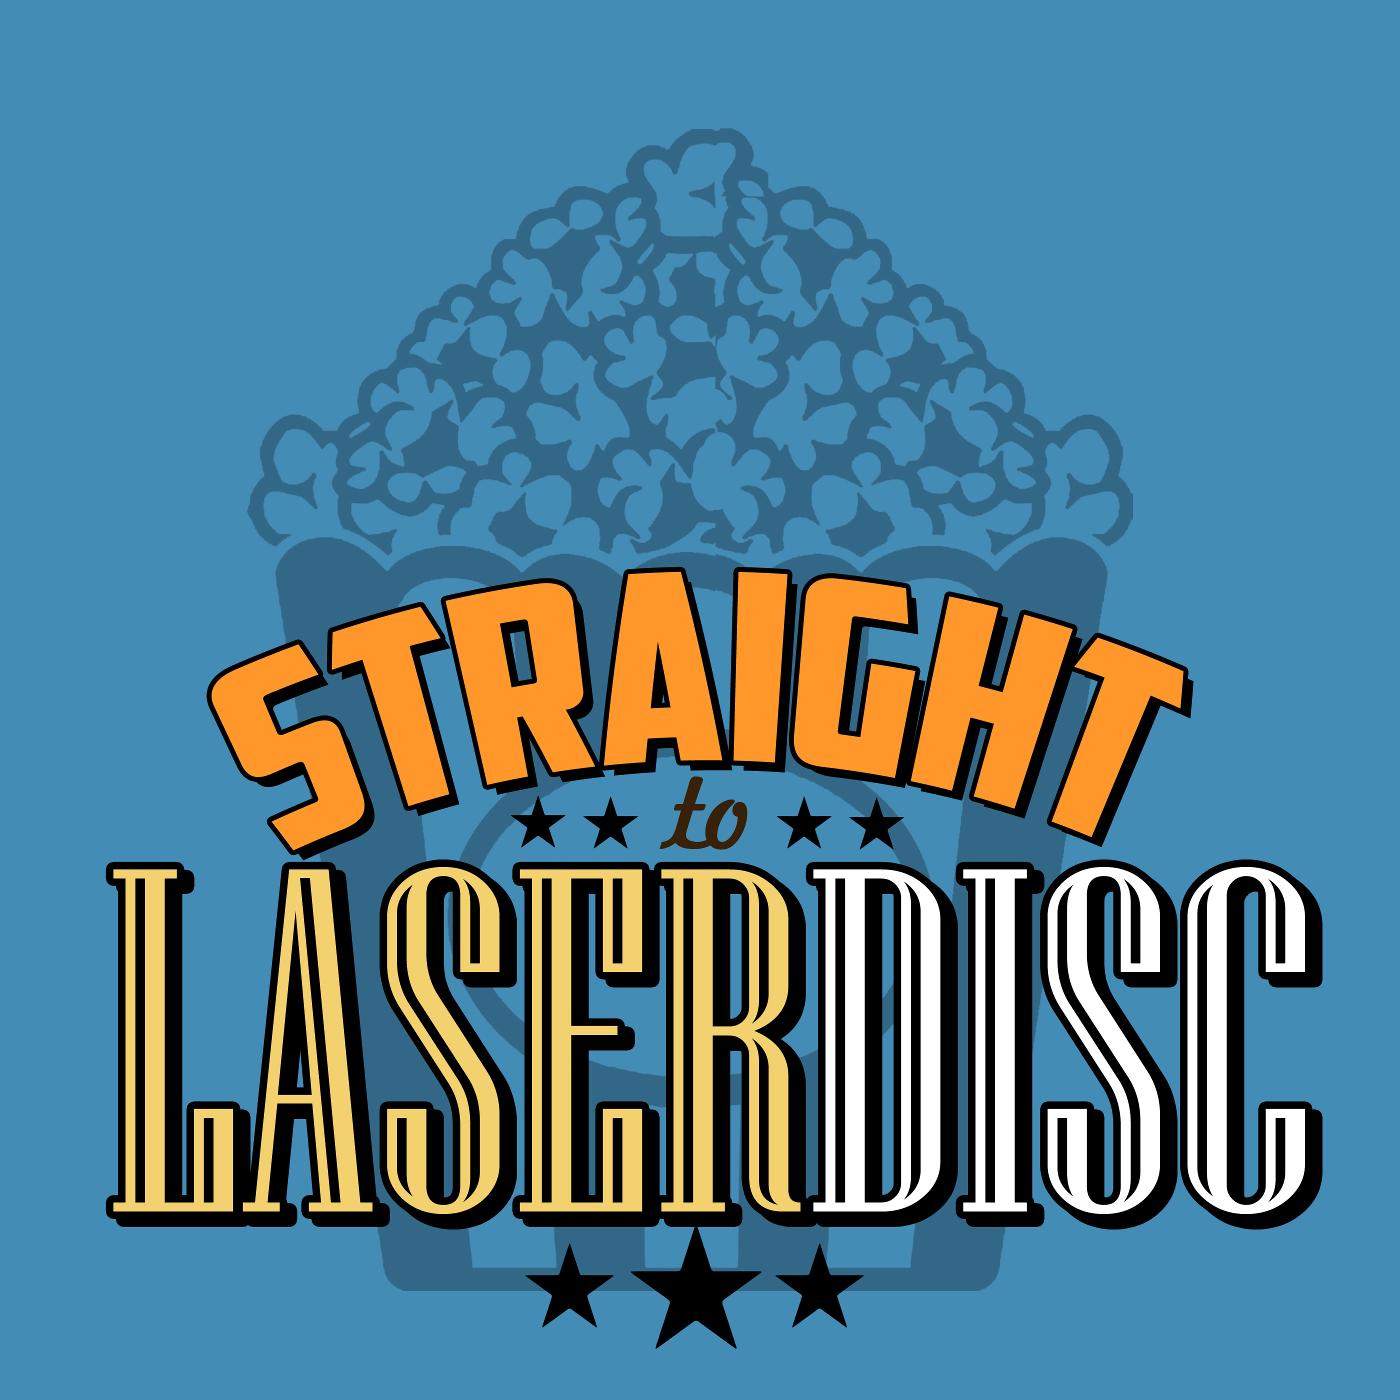 Straight to LaserDisc show art